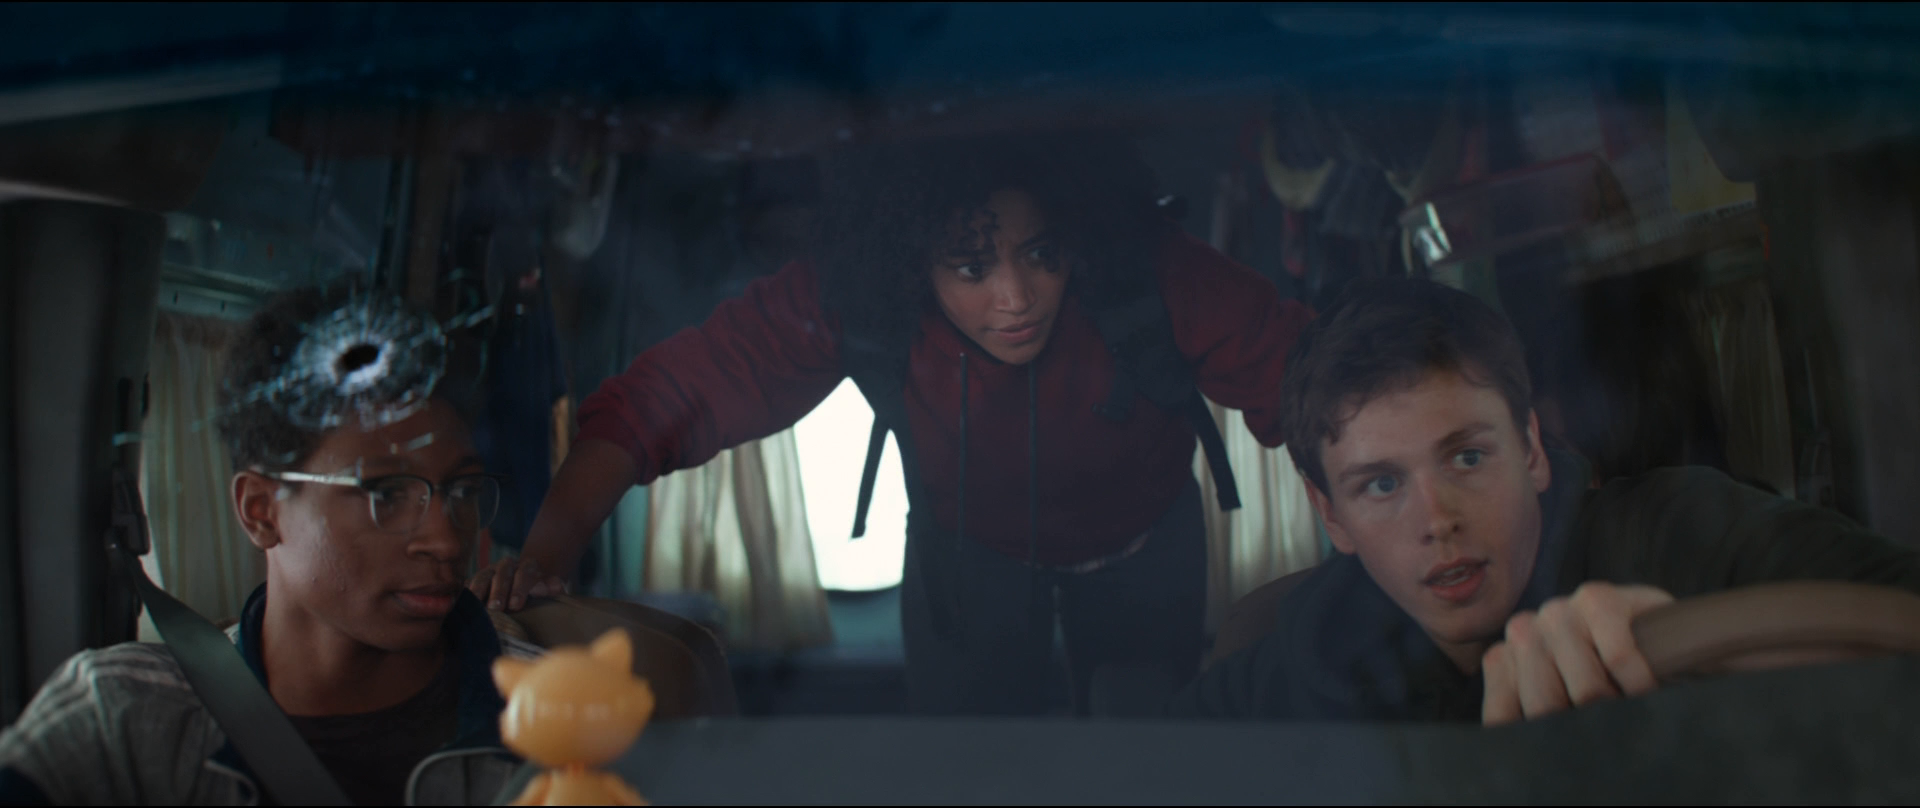 Karanlık Zihinler - The Darkest Minds | 2018 | BluRay | BDRip - 720p - 1080p | DUAL | Türkçe Dublaj